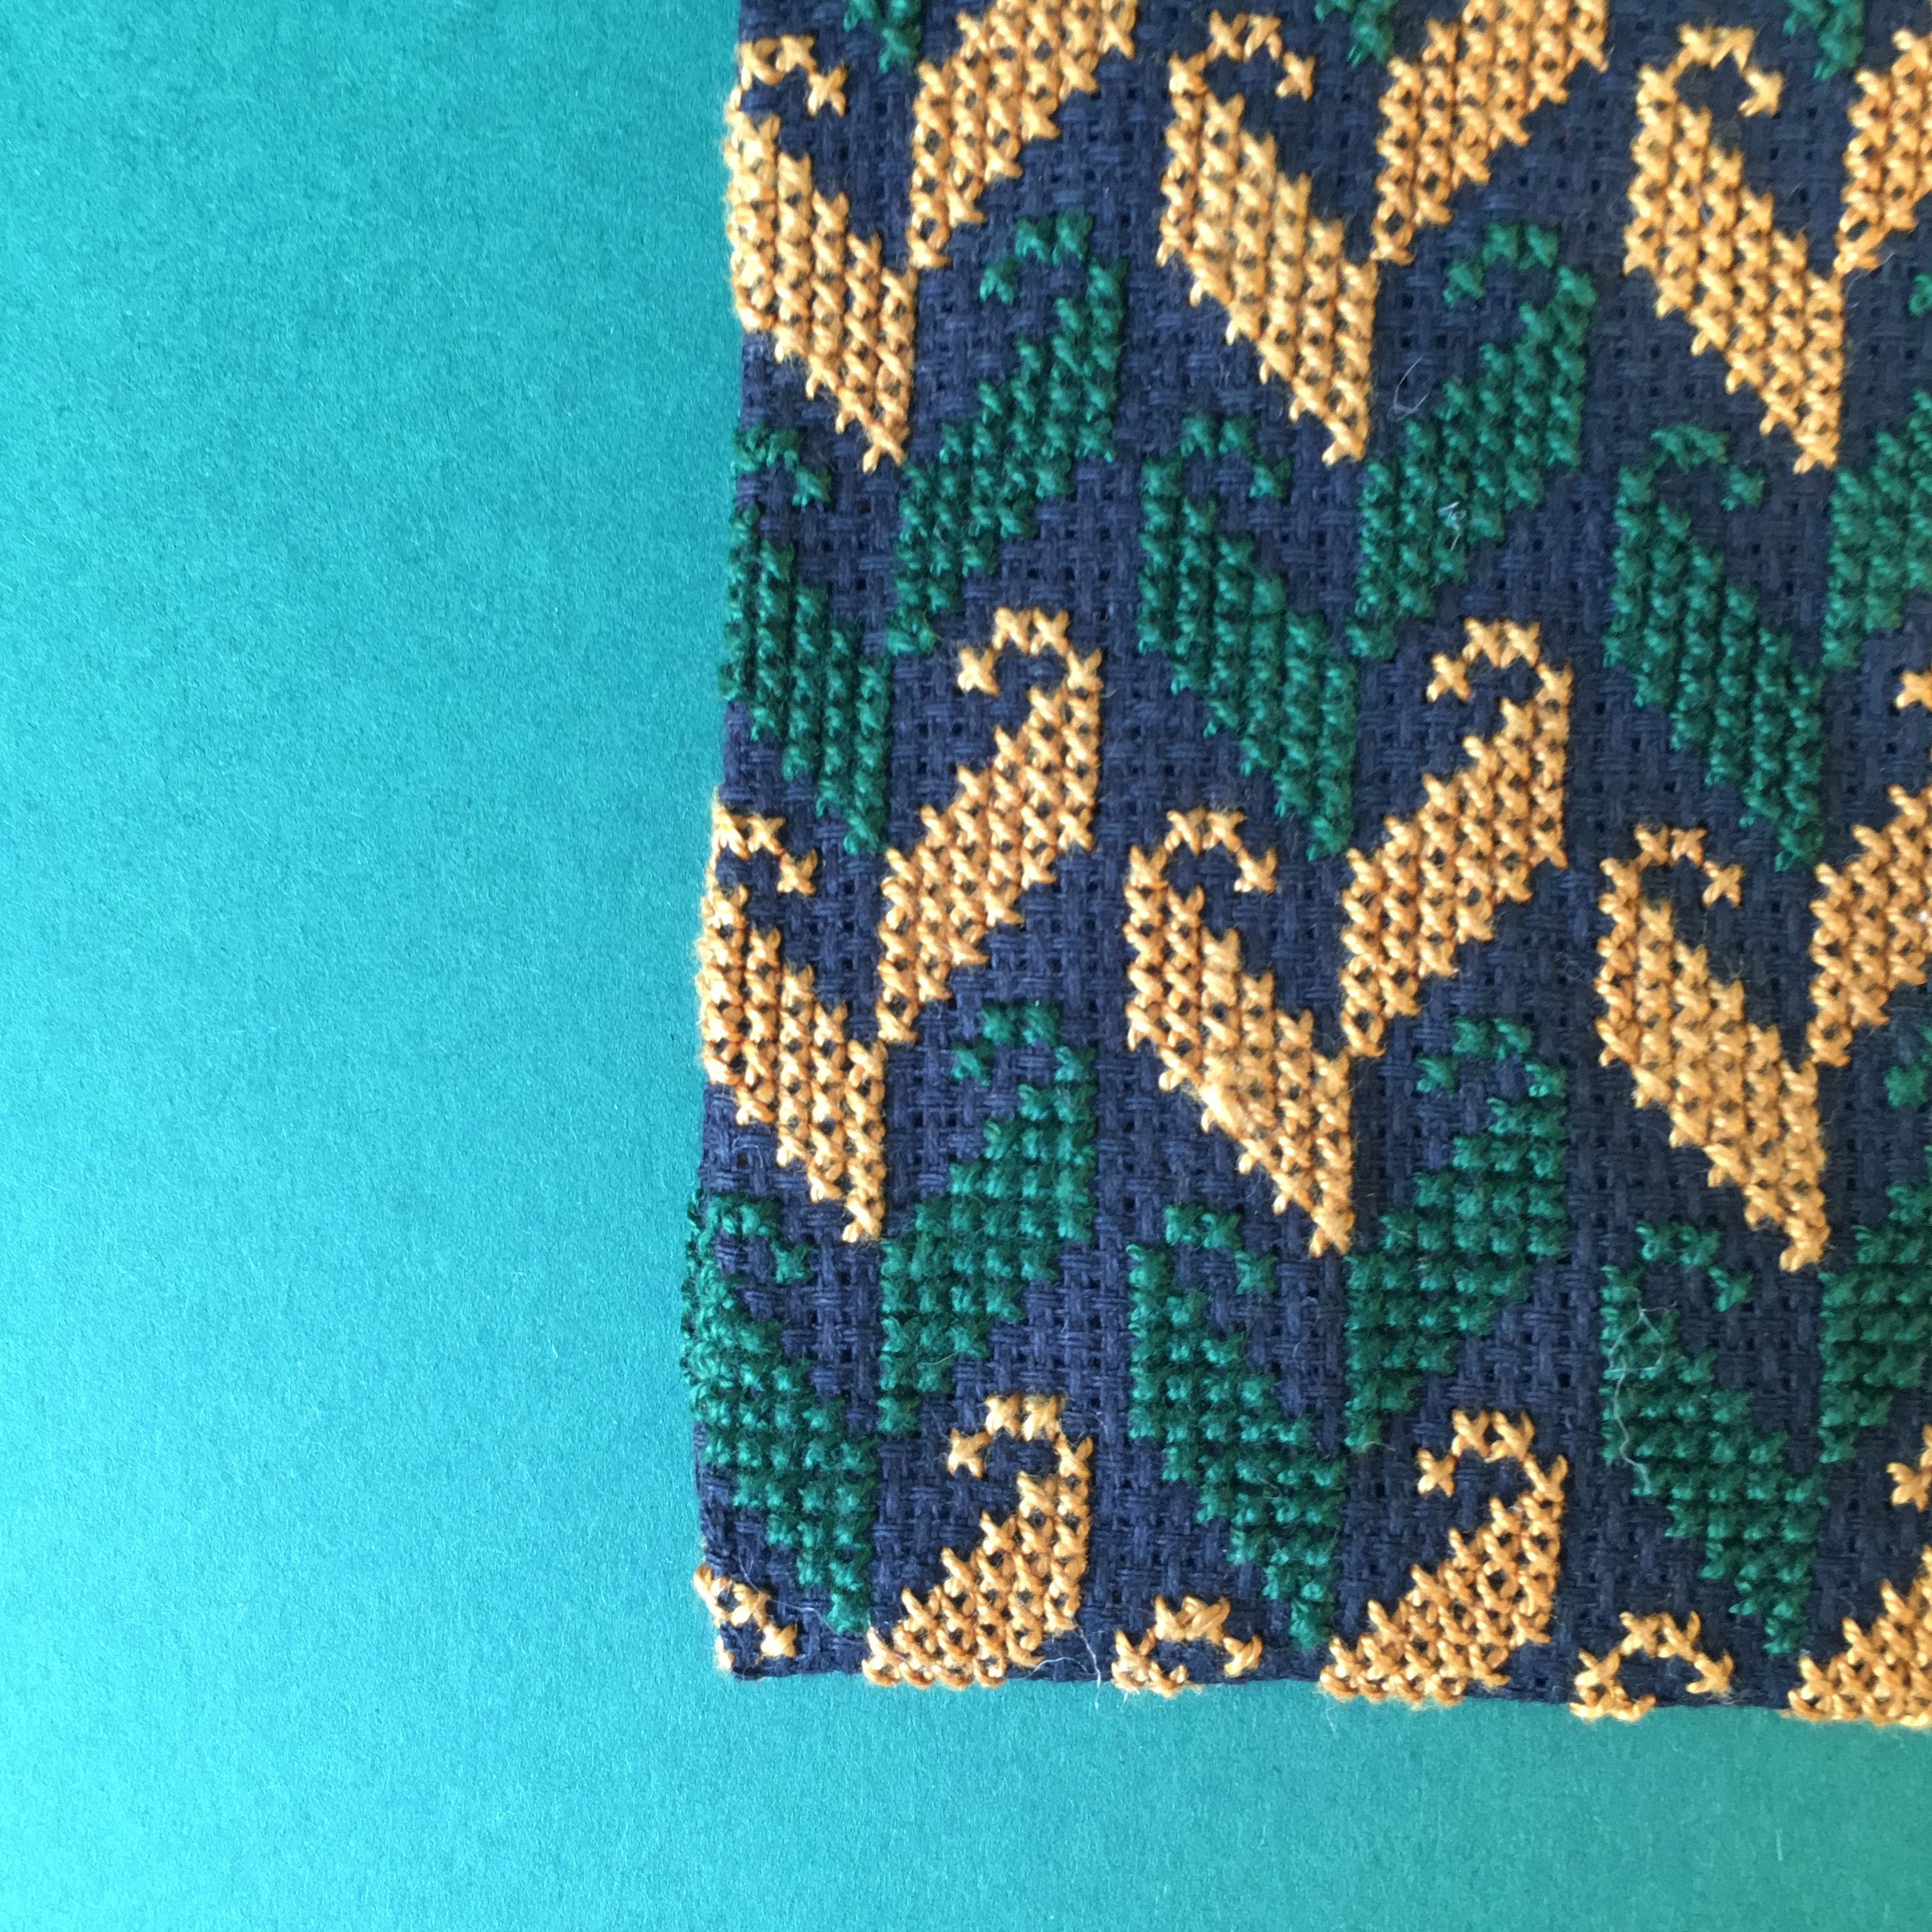 Stor brodert pung, svart, grønn og gul